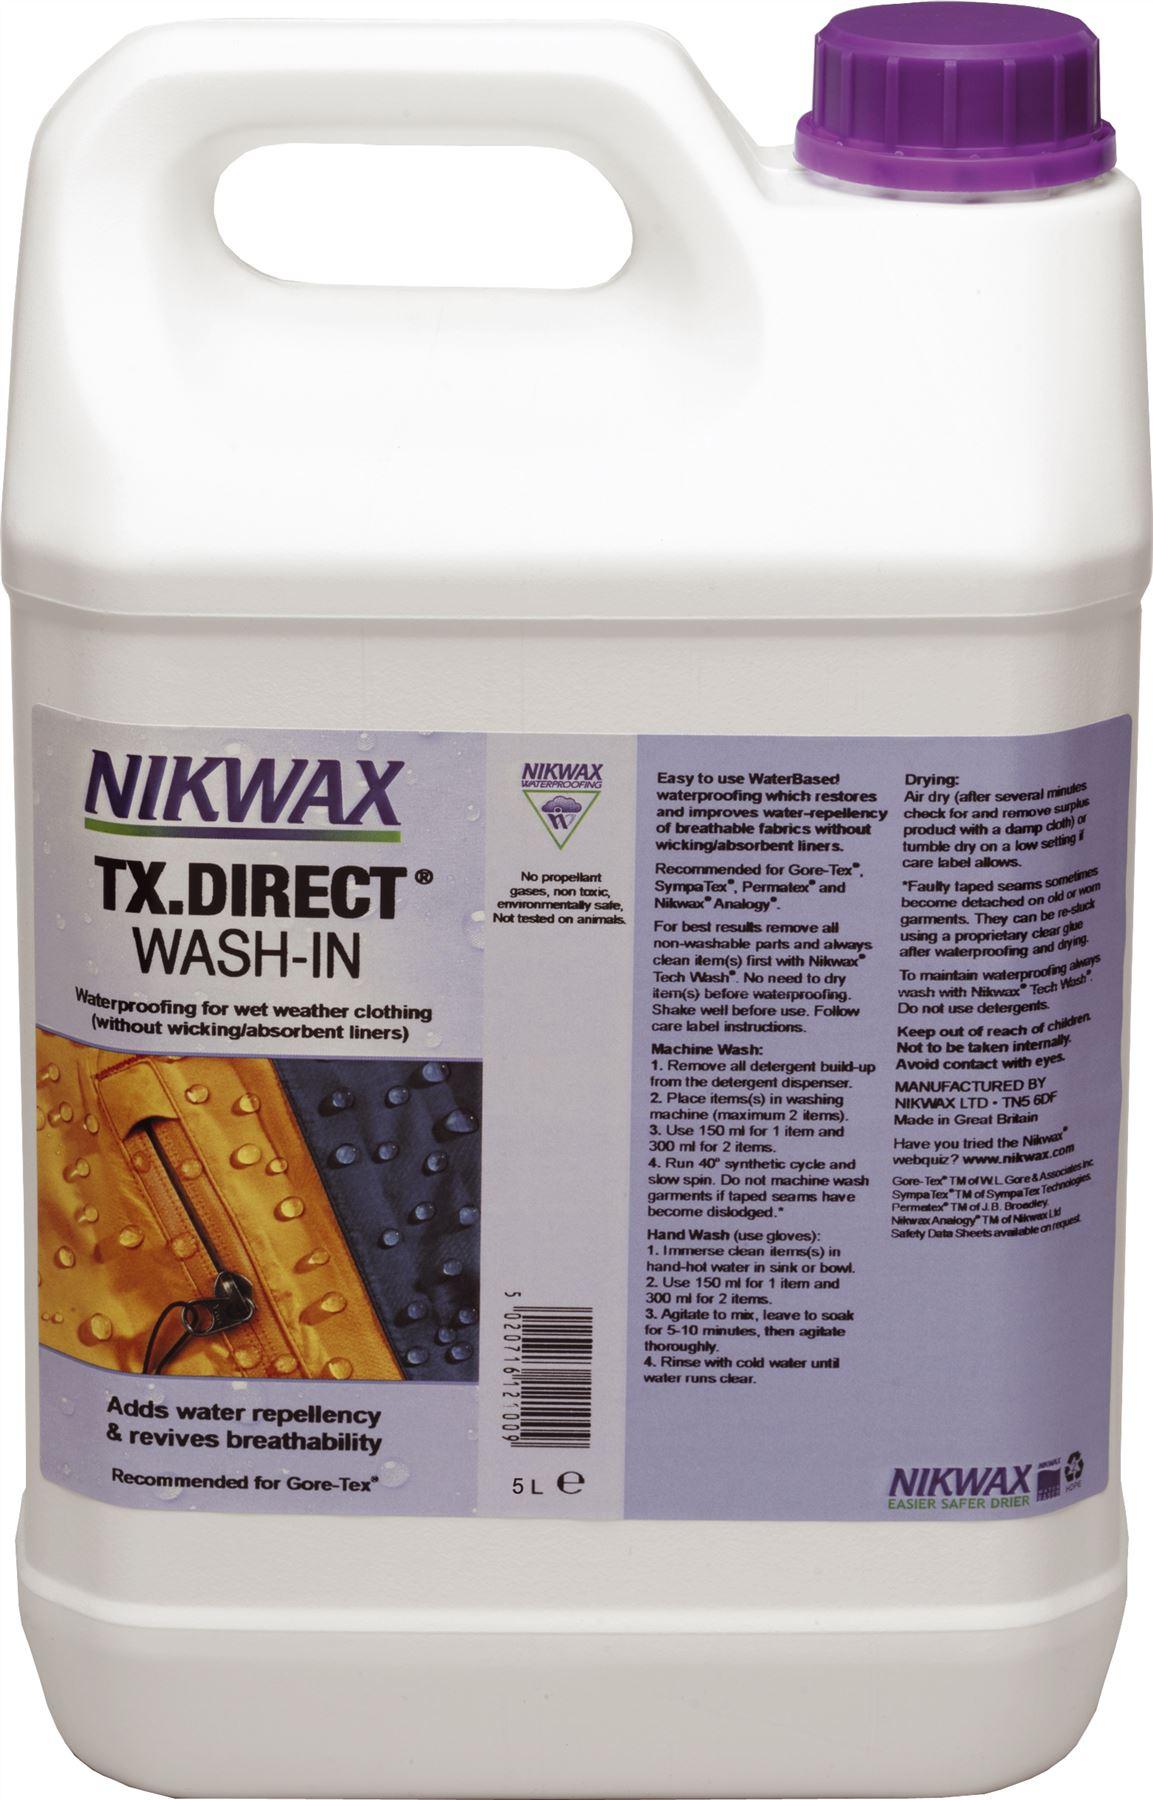 Nikwax TX Direct Wash-nella Clothing cura equina Cavallo Clothing Wash-nella 7b2c68